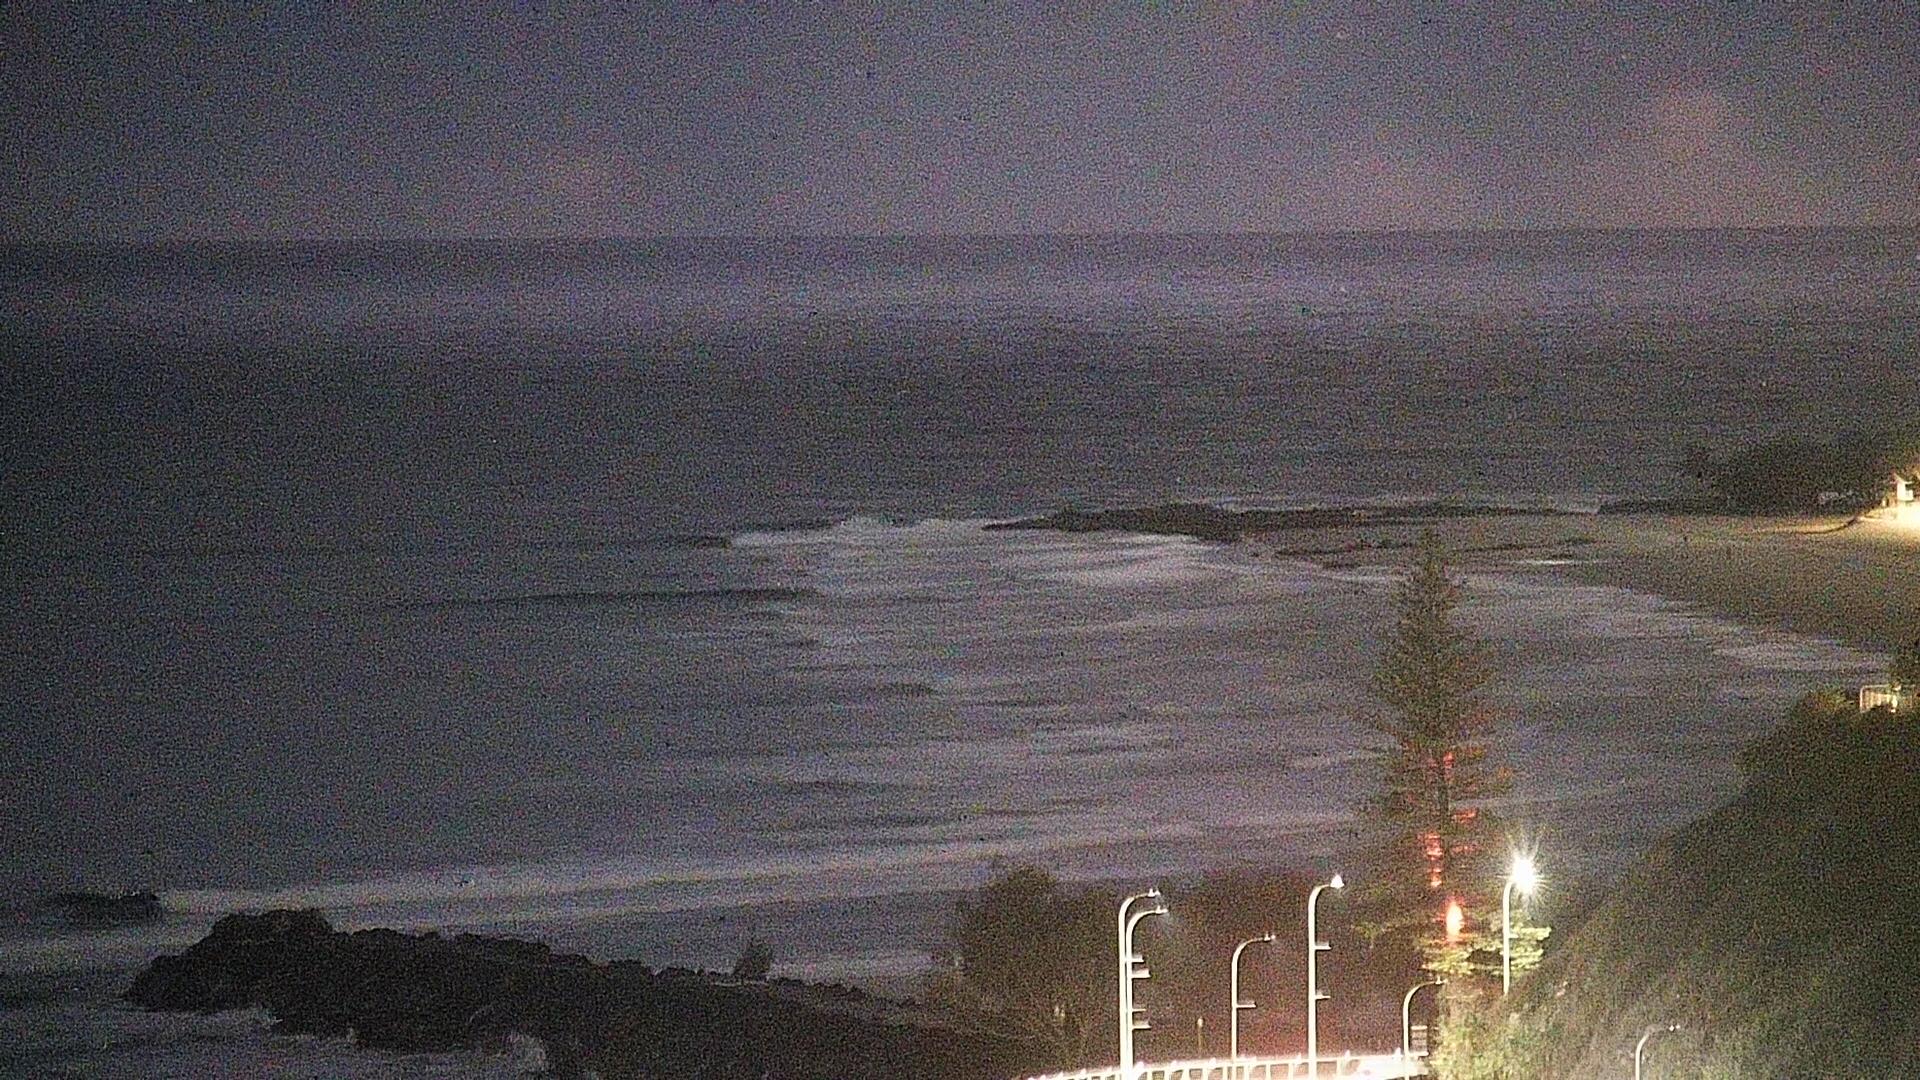 Superbank surfcam still image